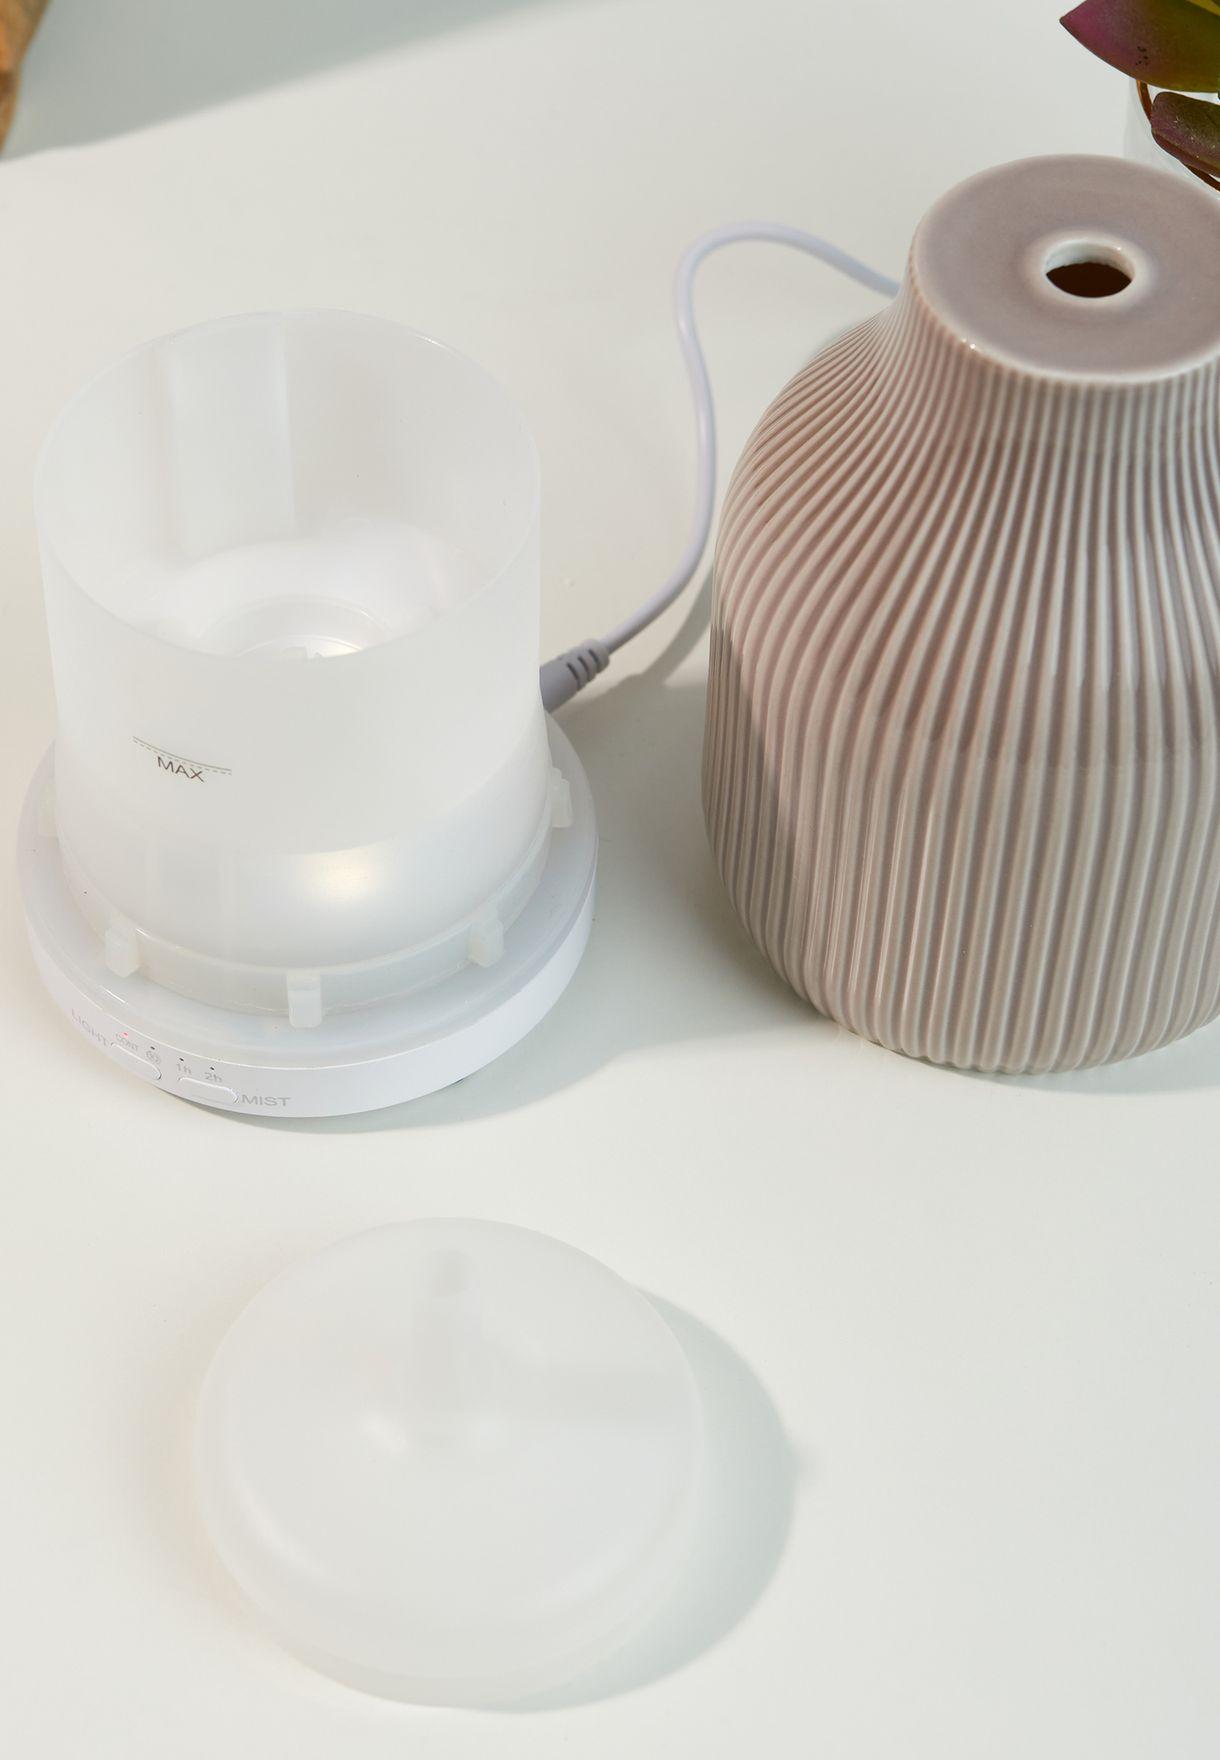 Purify & Balance Ceramic Ultrasonic Oil Diffuser